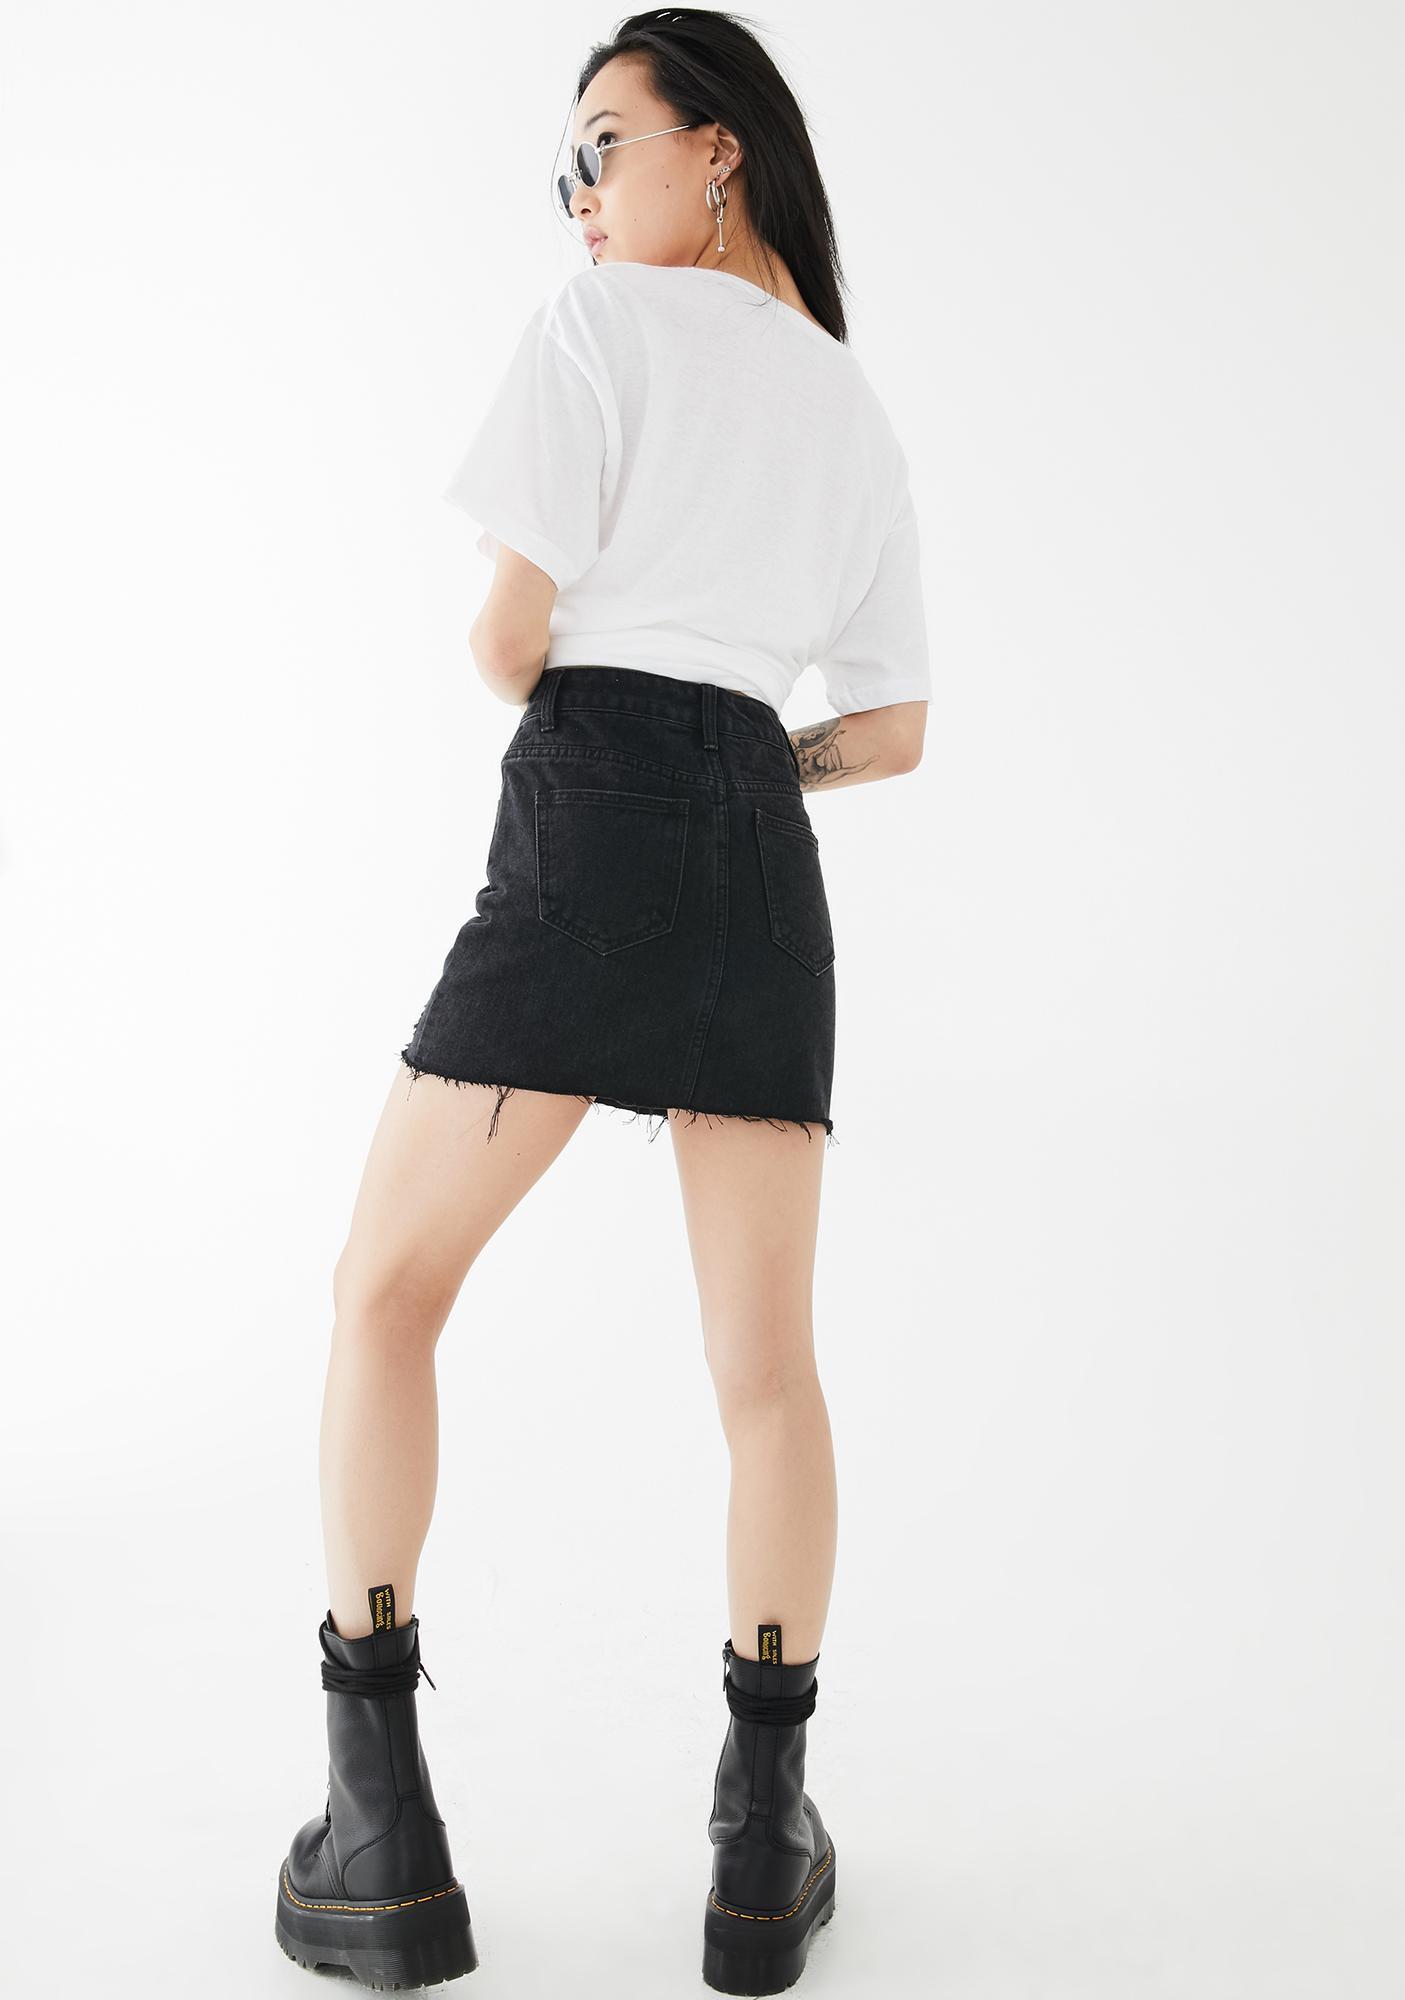 Momokrom One Sided Distressed Hem Denim Skirt